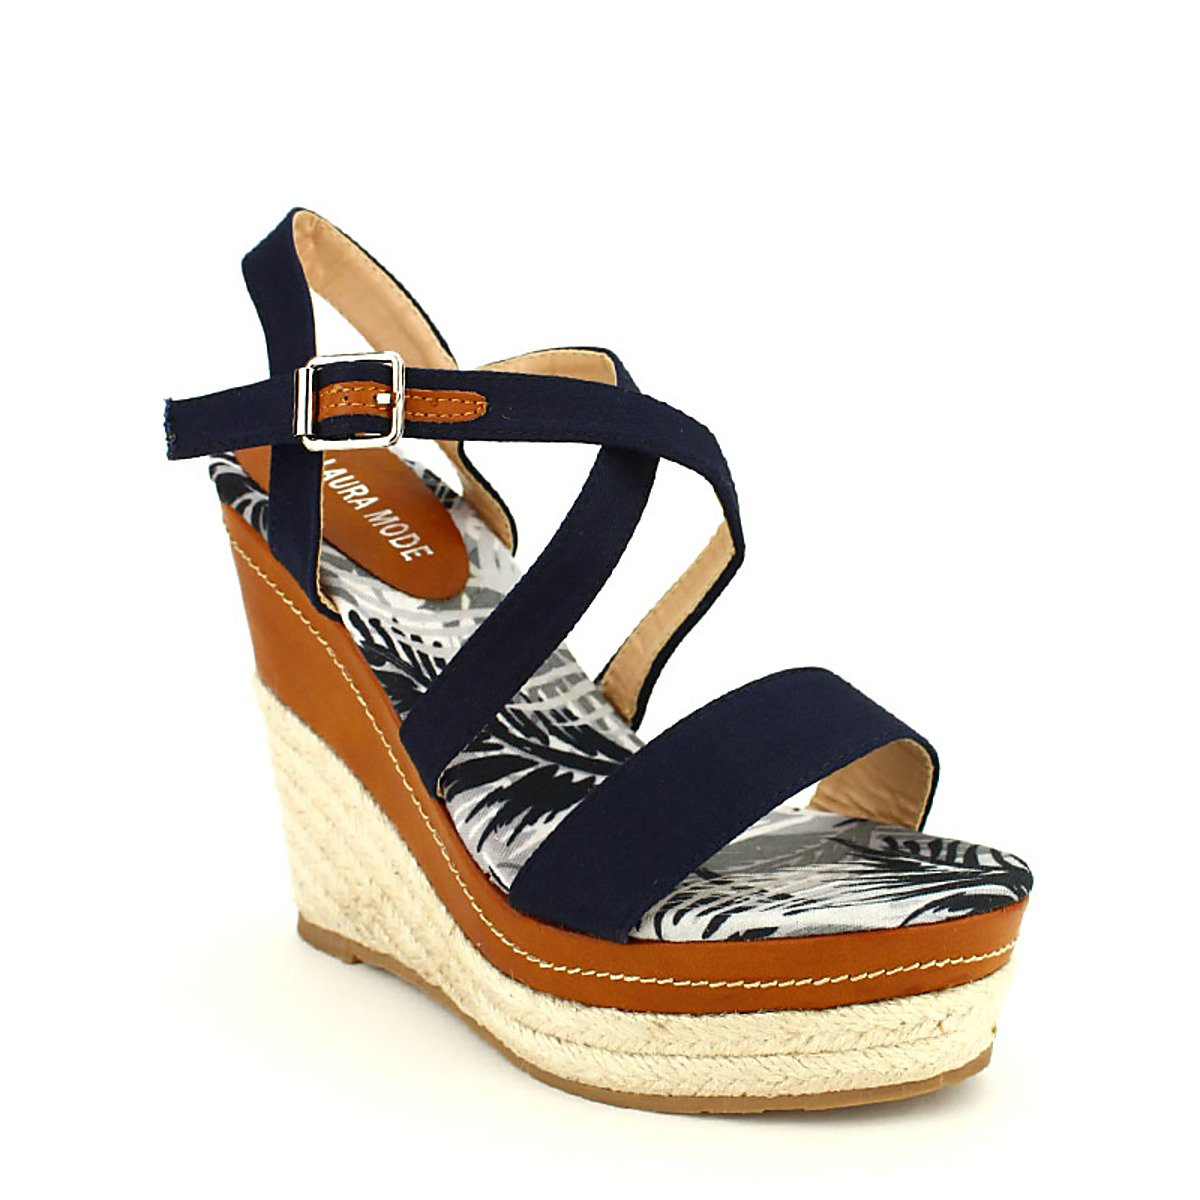 8ad8a5070aa2c0 Compensée Bleue HAWAÏ Mode Chaussures Femme Compensée Bleue HAWAÏ Mode Chaussures  Femme Taille 38 Chaussures Cendriyon Espadrilles